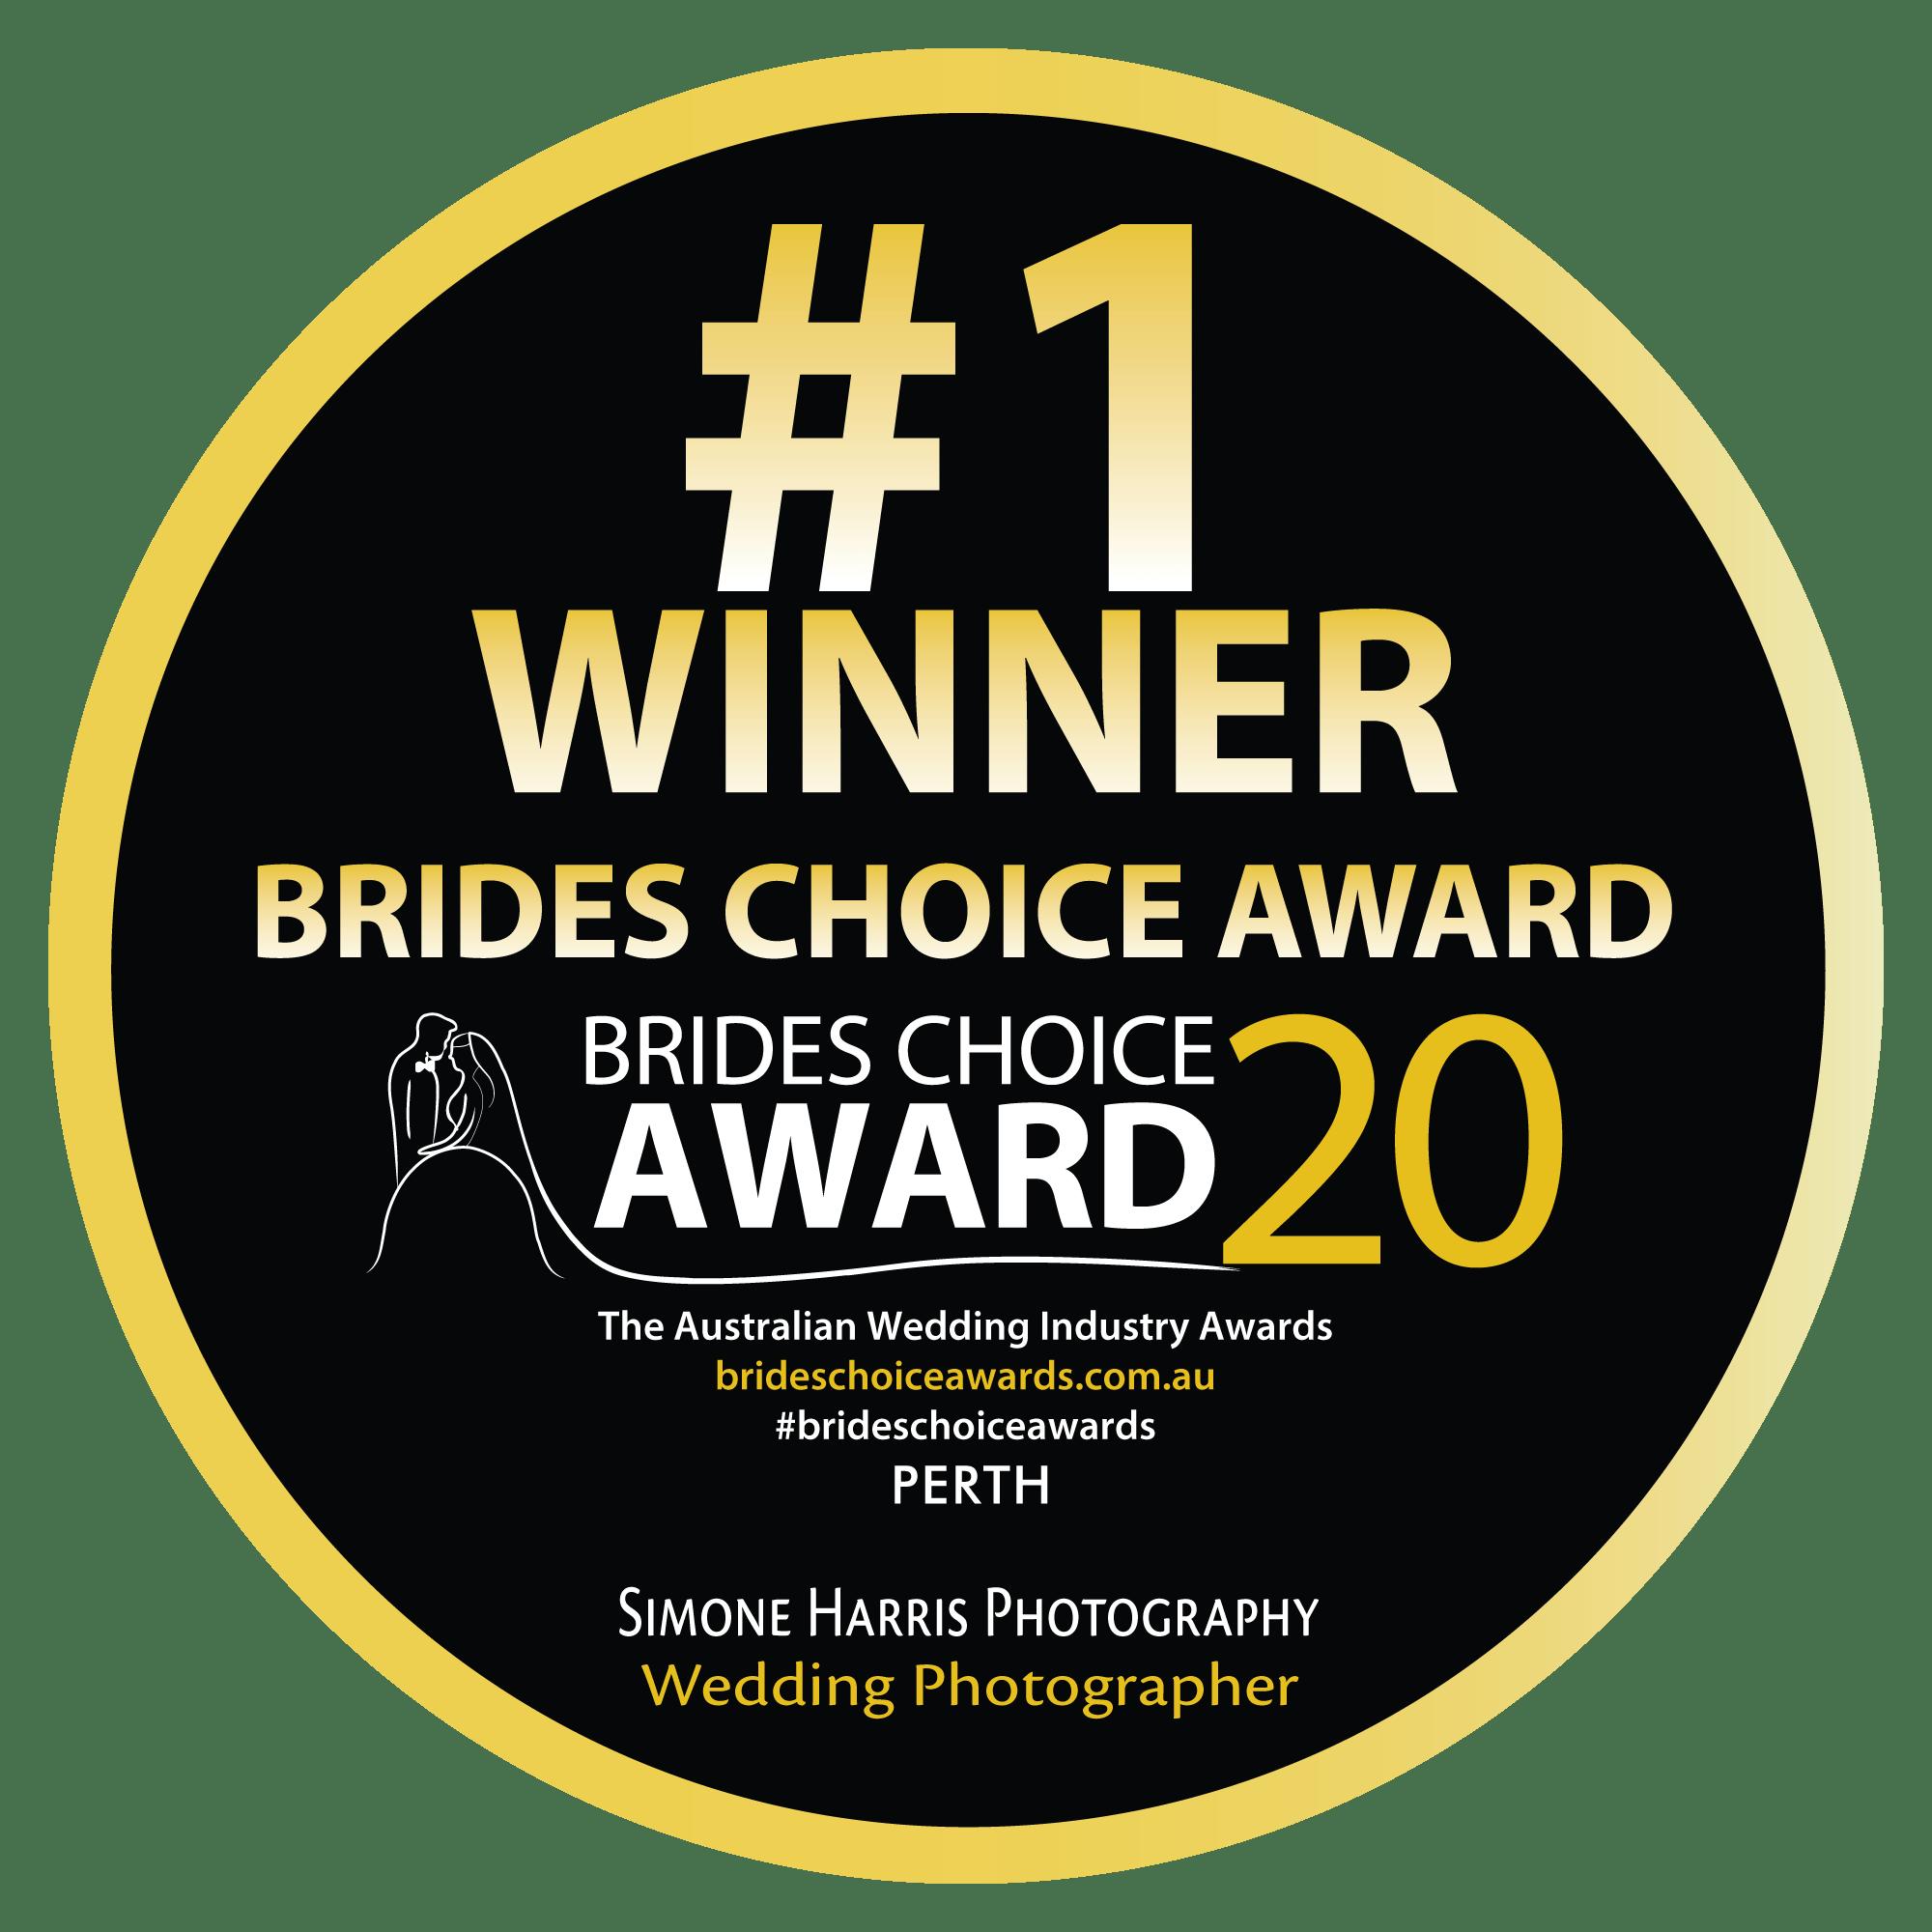 Simone-Harris-Photography_P_Winner_brides_choice_award_perth_2020_photography